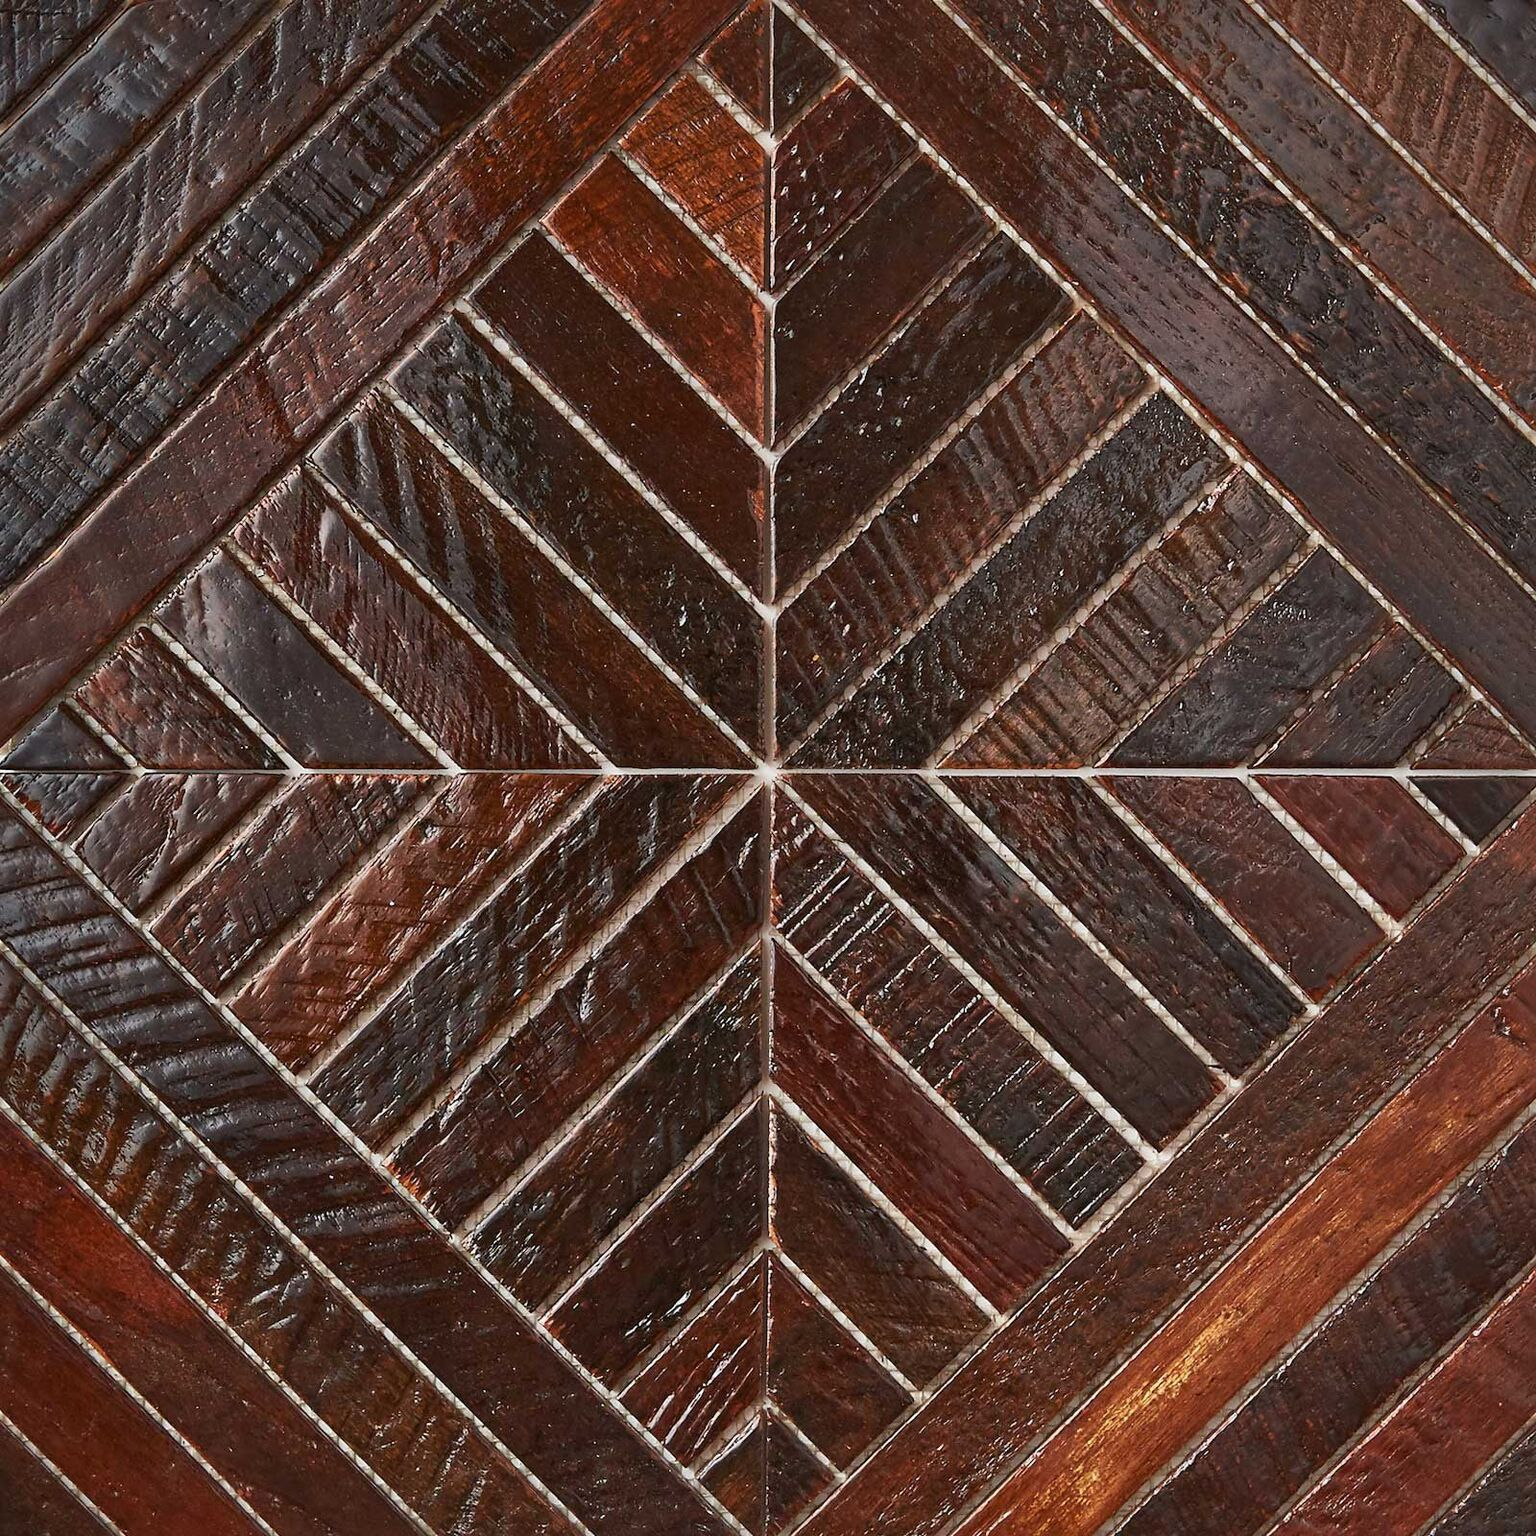 patina resin finish 3 - Teak Tile - Align